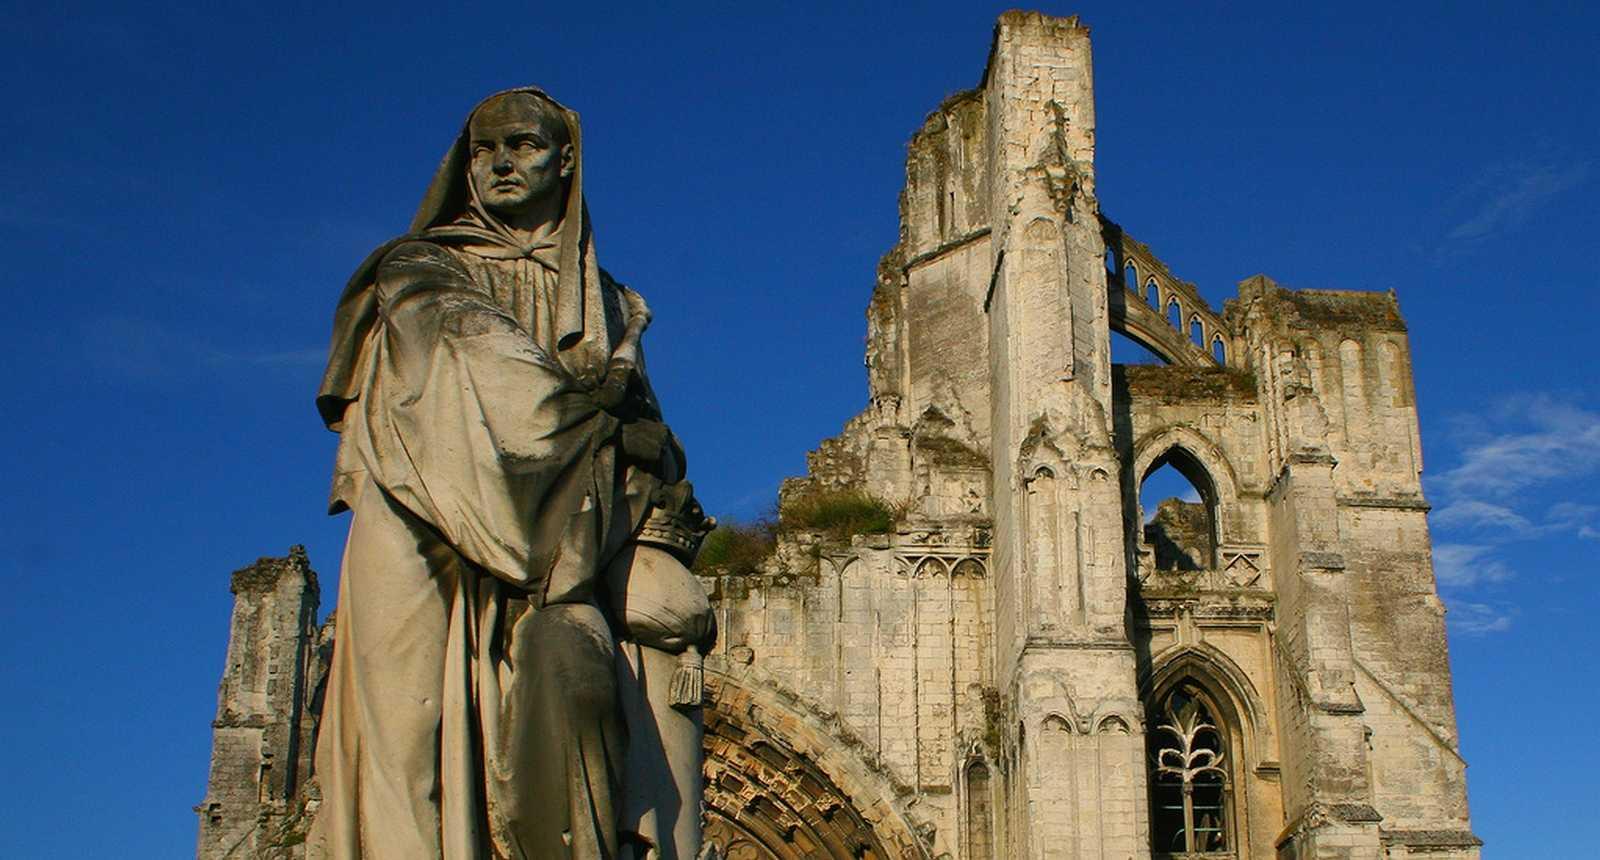 Ruines de l'Abbaye de Saint-Bertin à Saint-Omer (1)